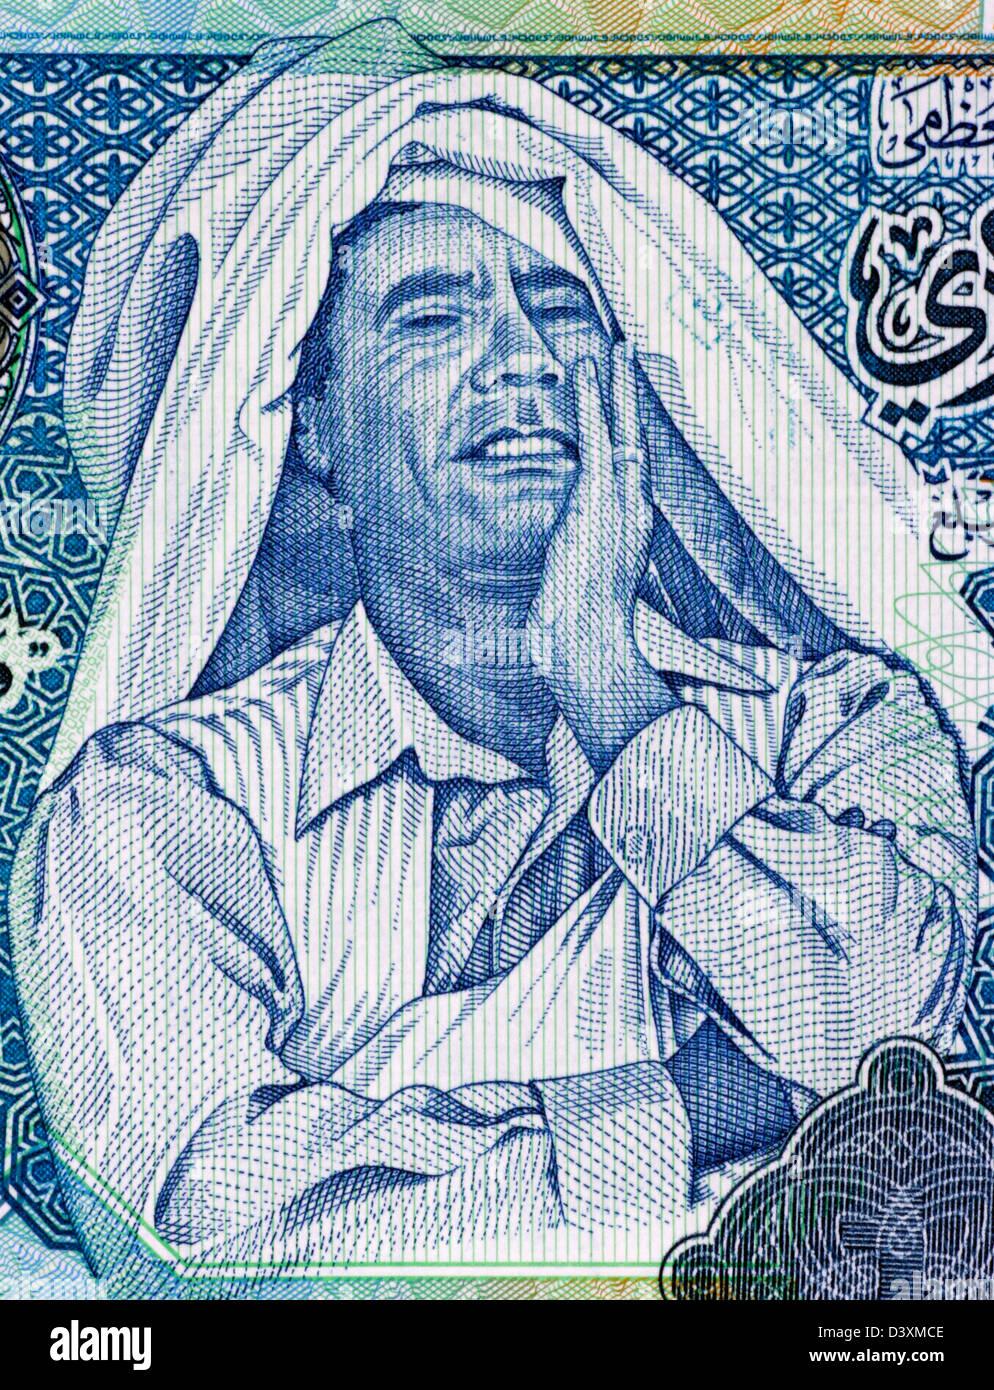 Muammar Gaddafi (1942-2011) on 1 Dinar 2004 Banknote from Libya. Ruler of Libya during 1969-2011. - Stock Image